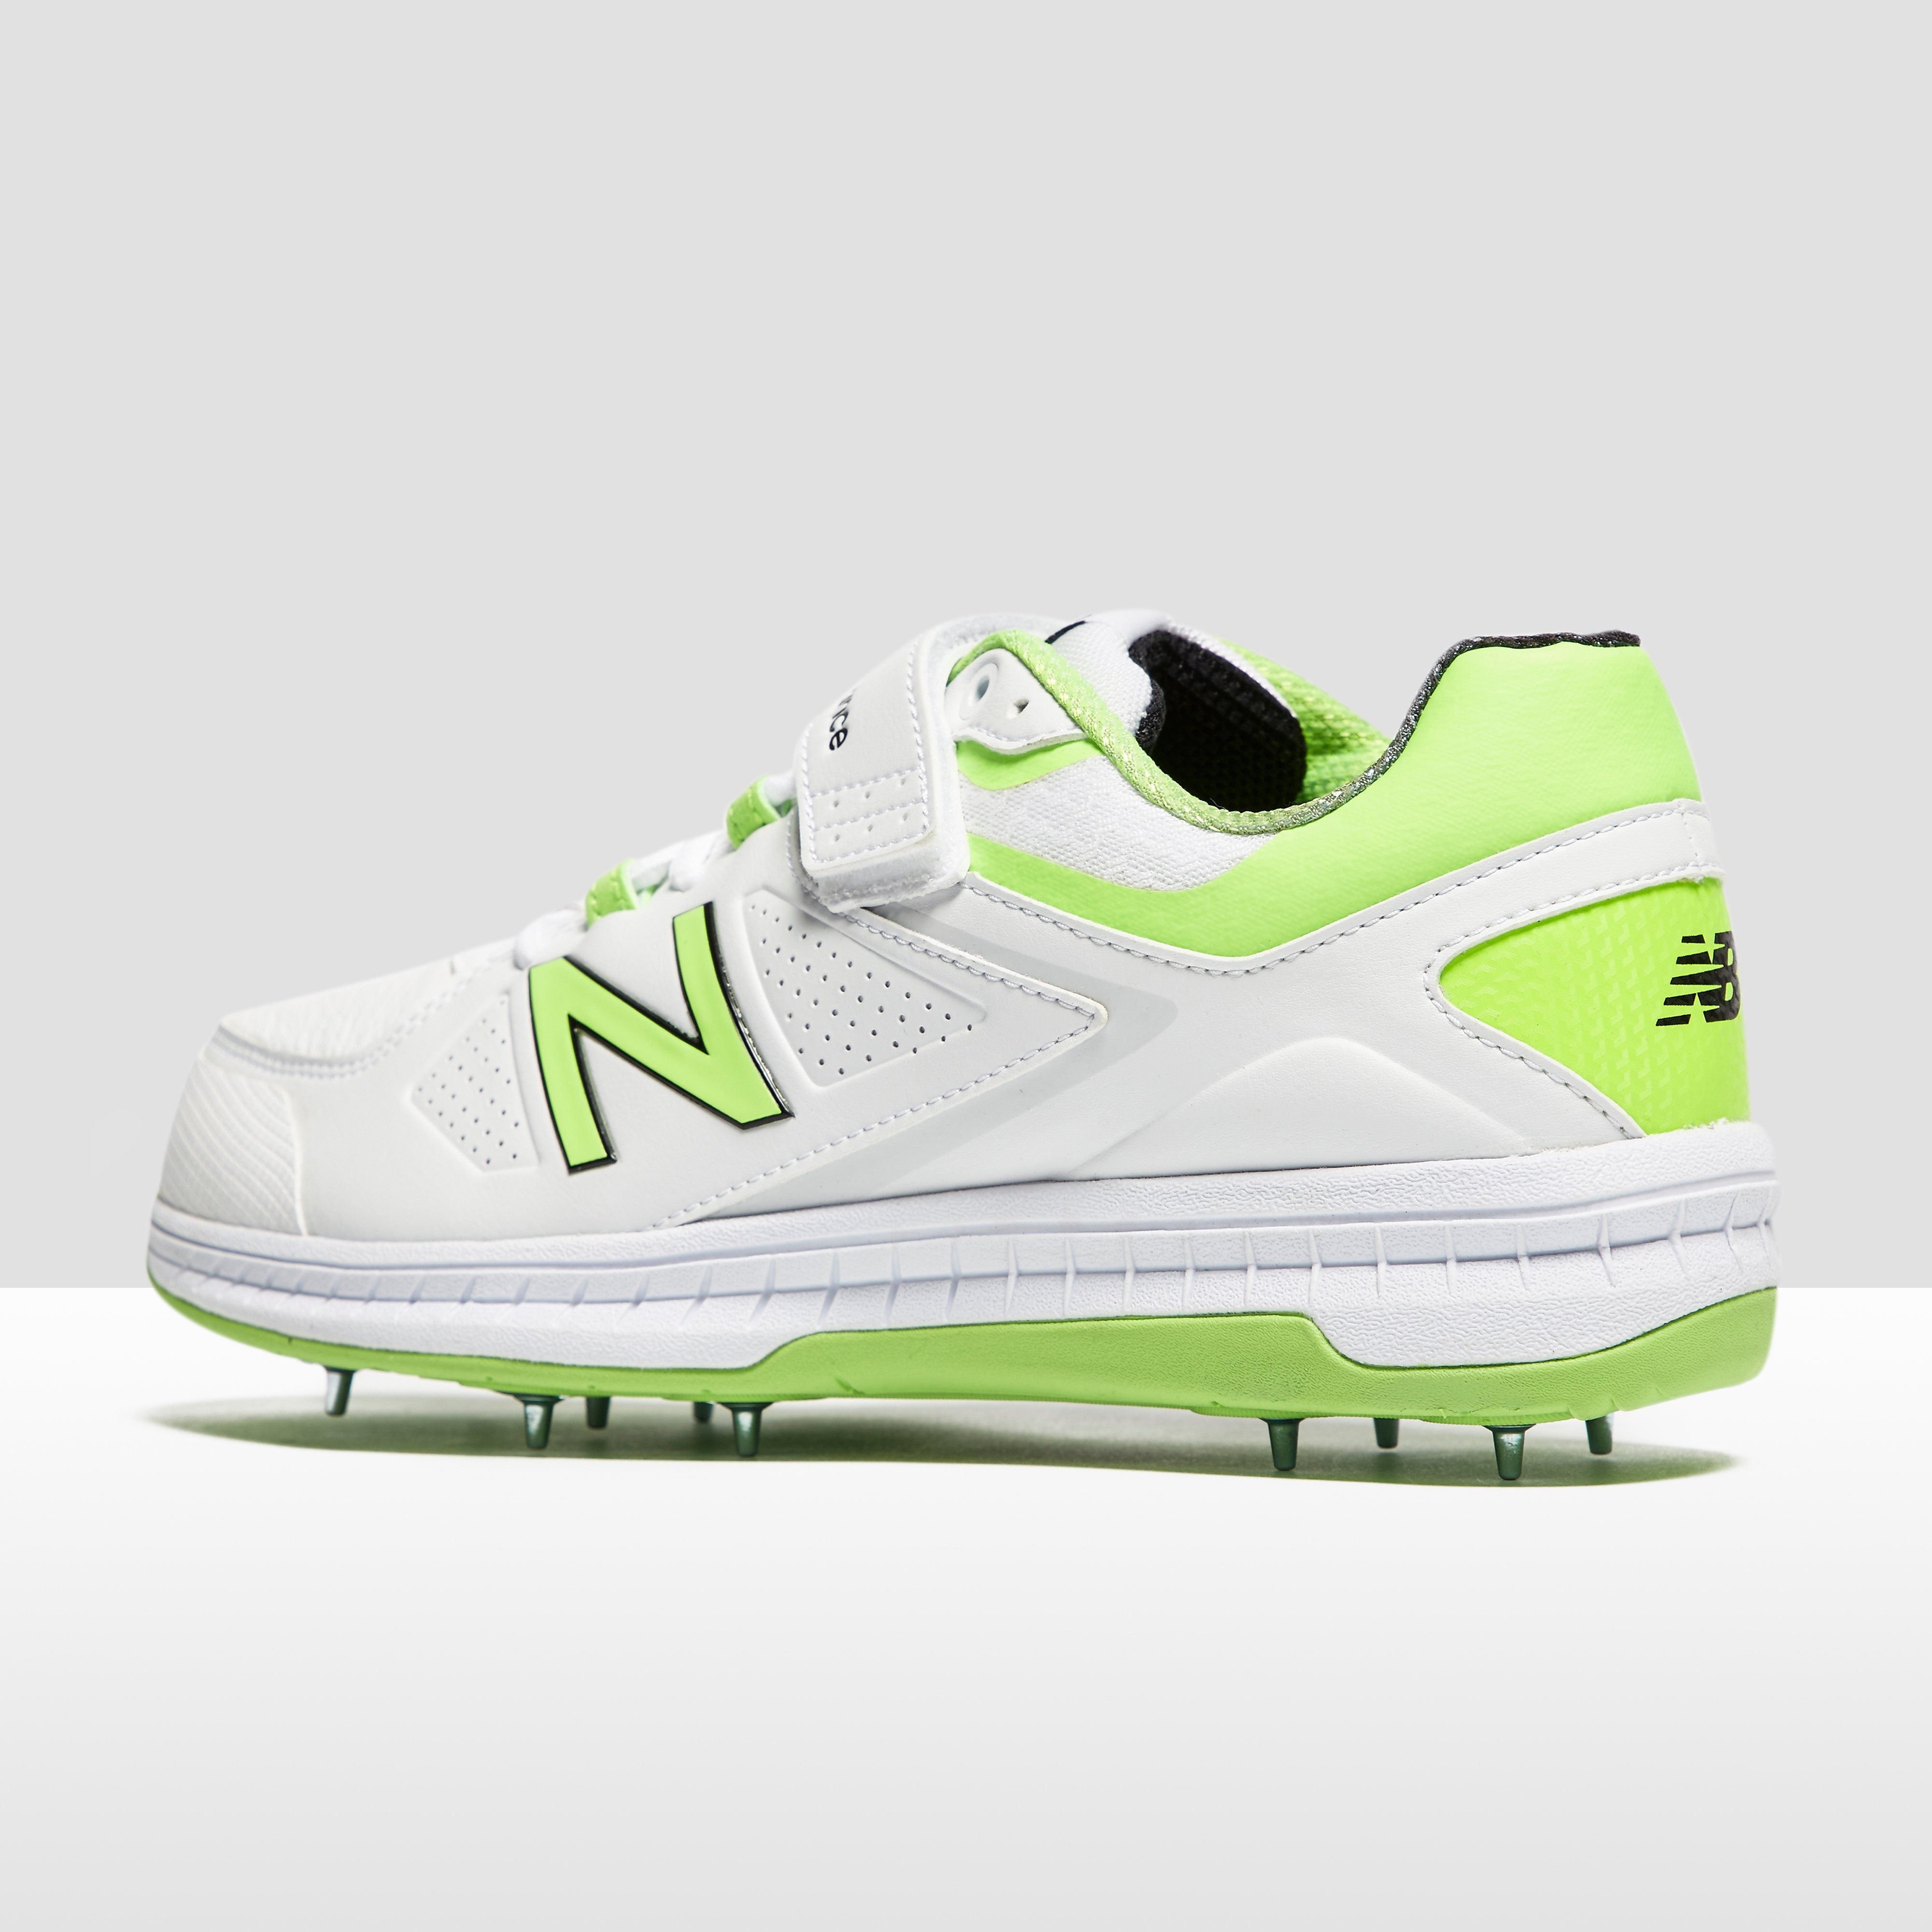 New Balance CK 40/40 R3 Men's Cricket Shoes